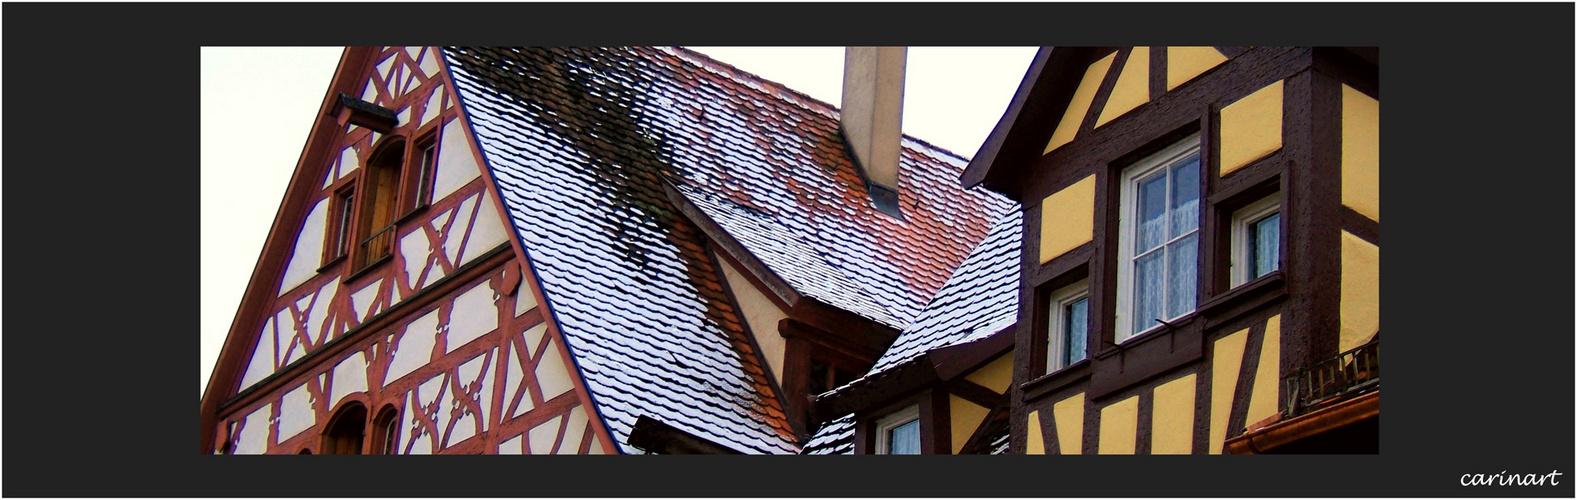 Maisons à colombages /Fachwerkhäuser